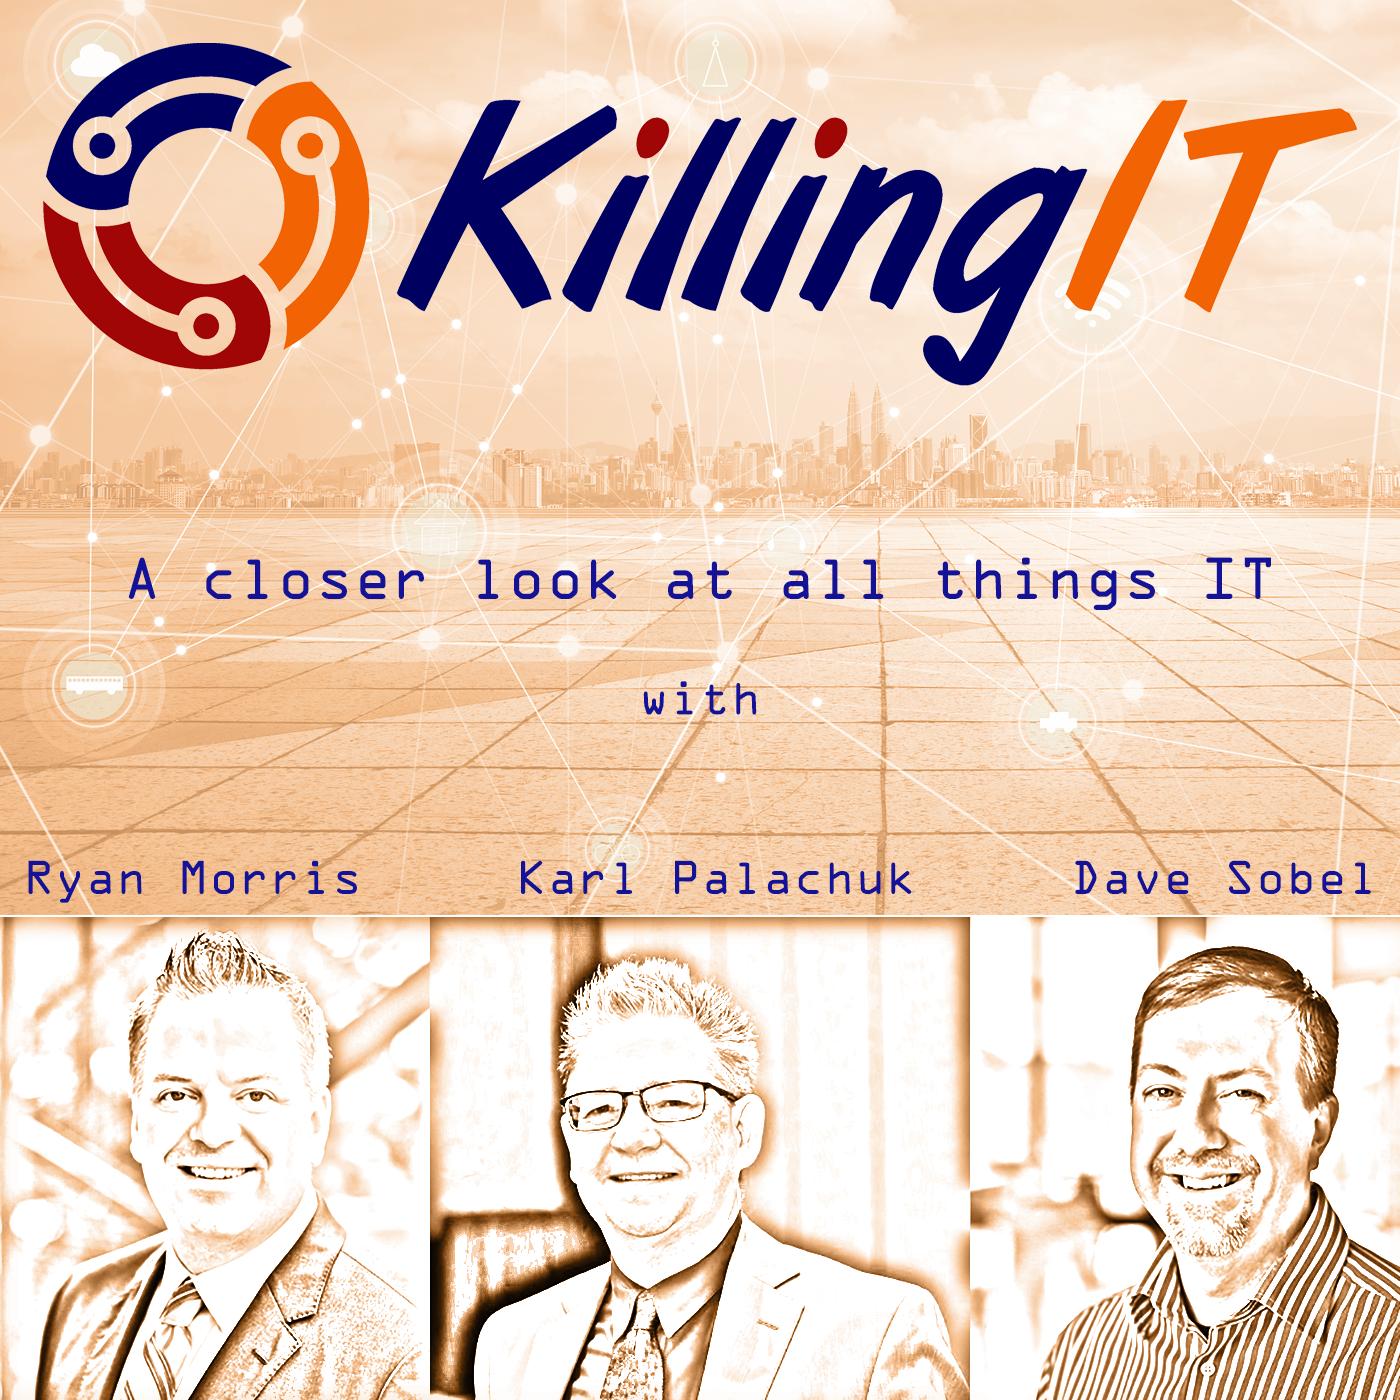 Episode 85 - Firing Robots, Analyzing AI, and Implementing Smart Tech show art